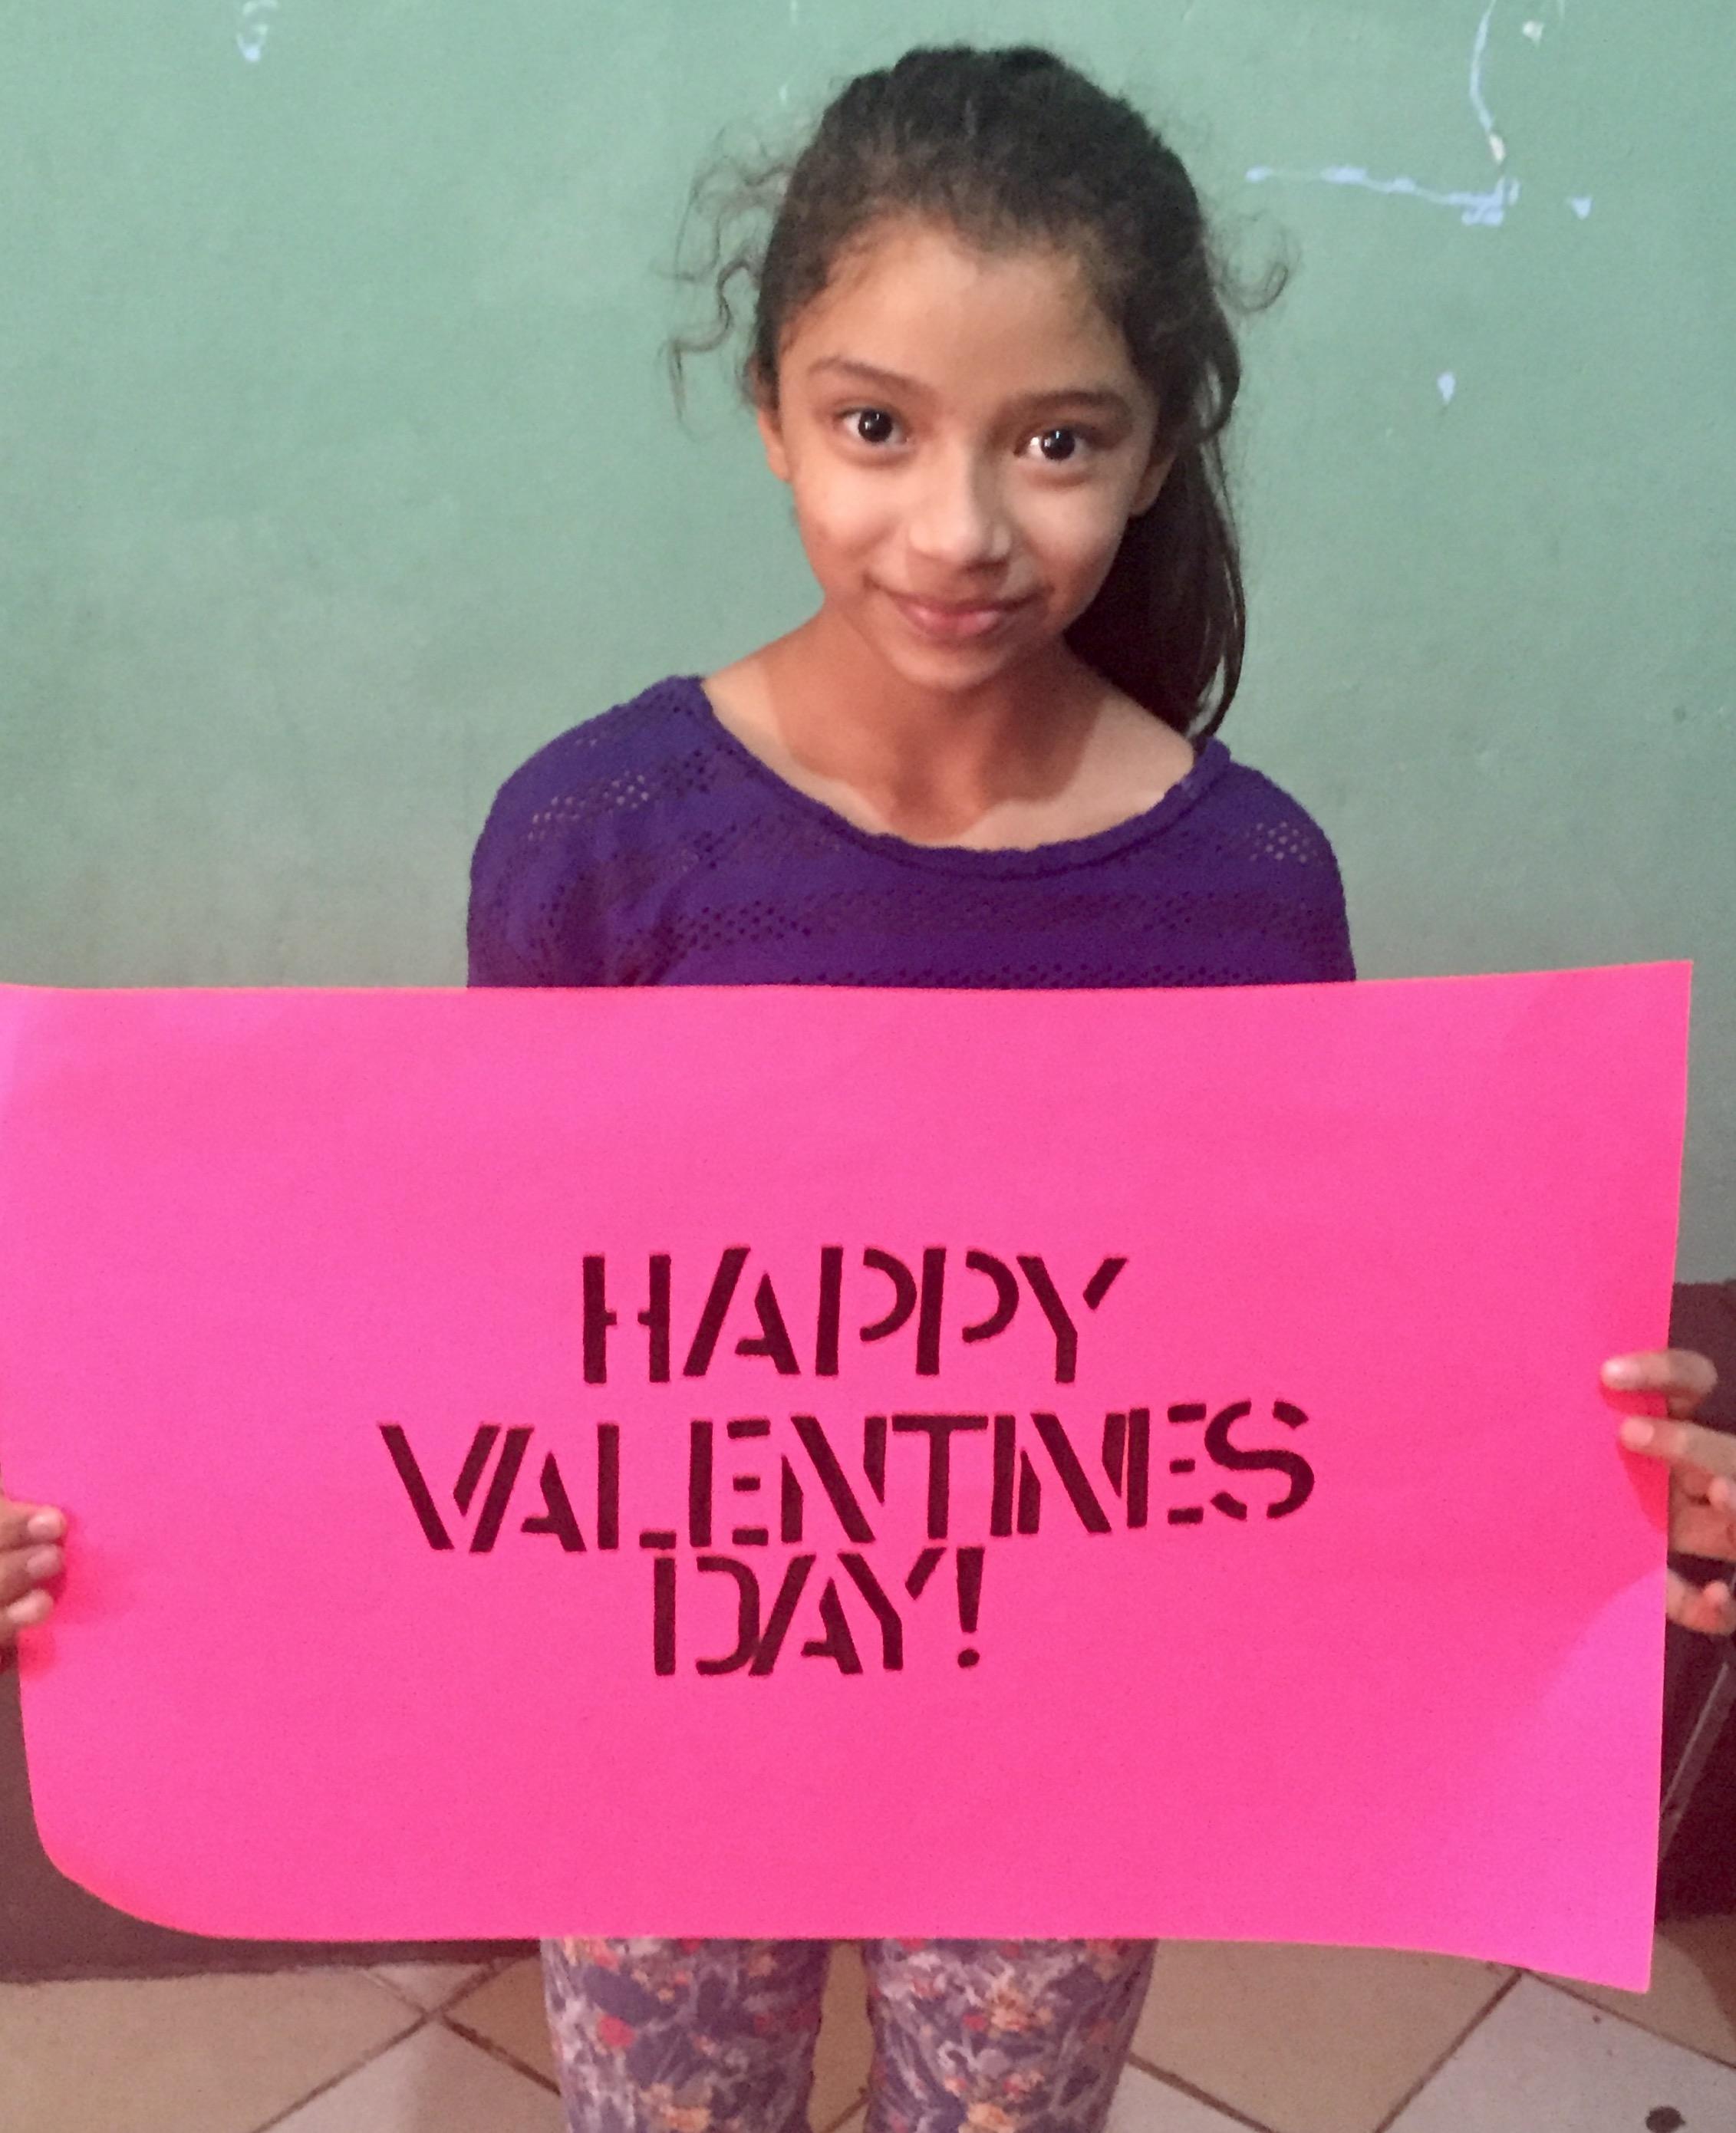 Leydi Valentines 2017